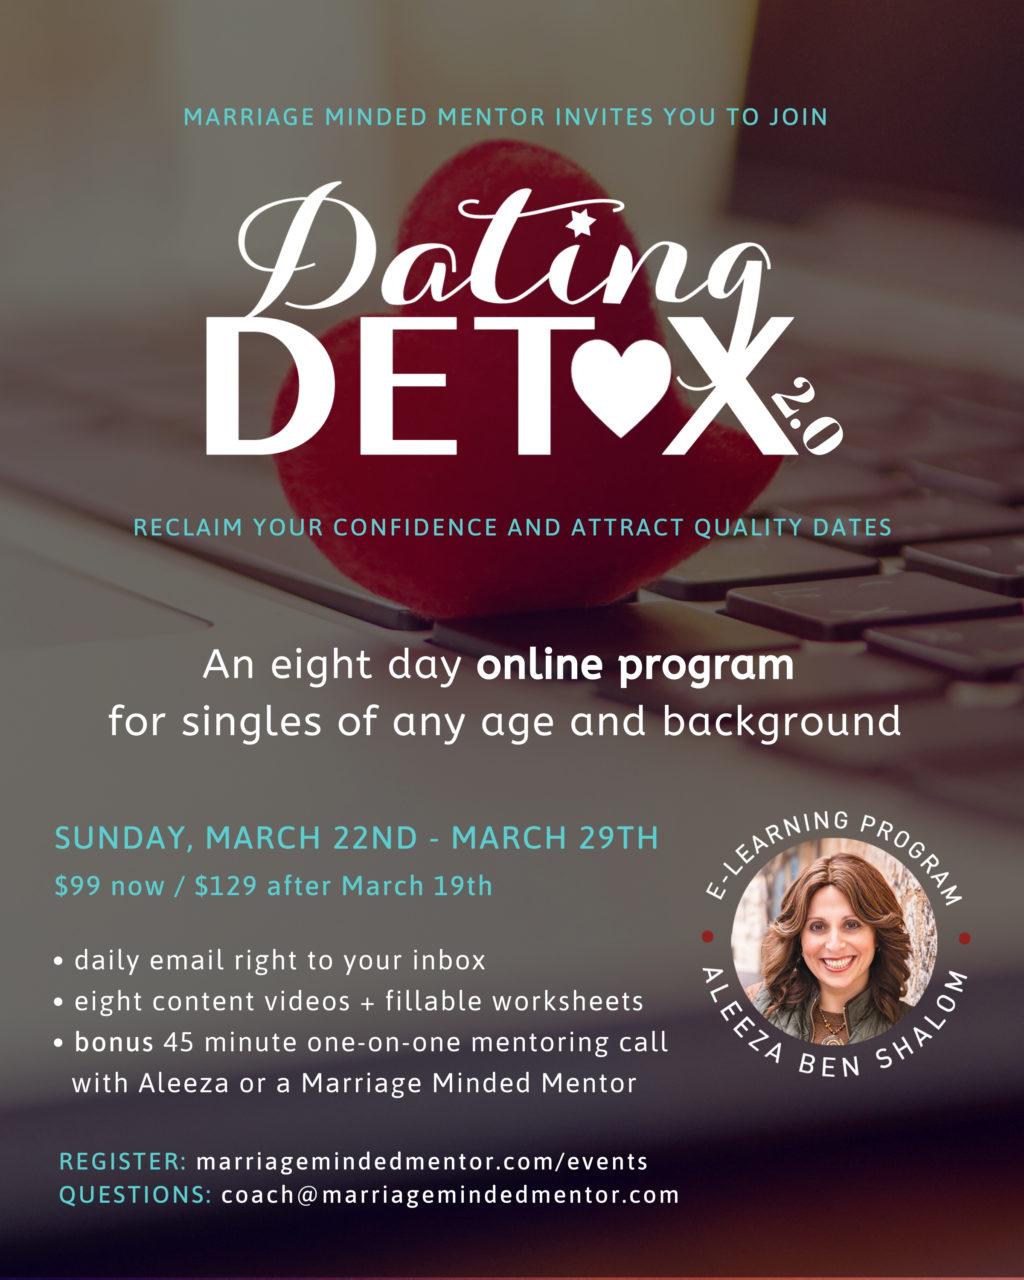 Dating Detox 2.0